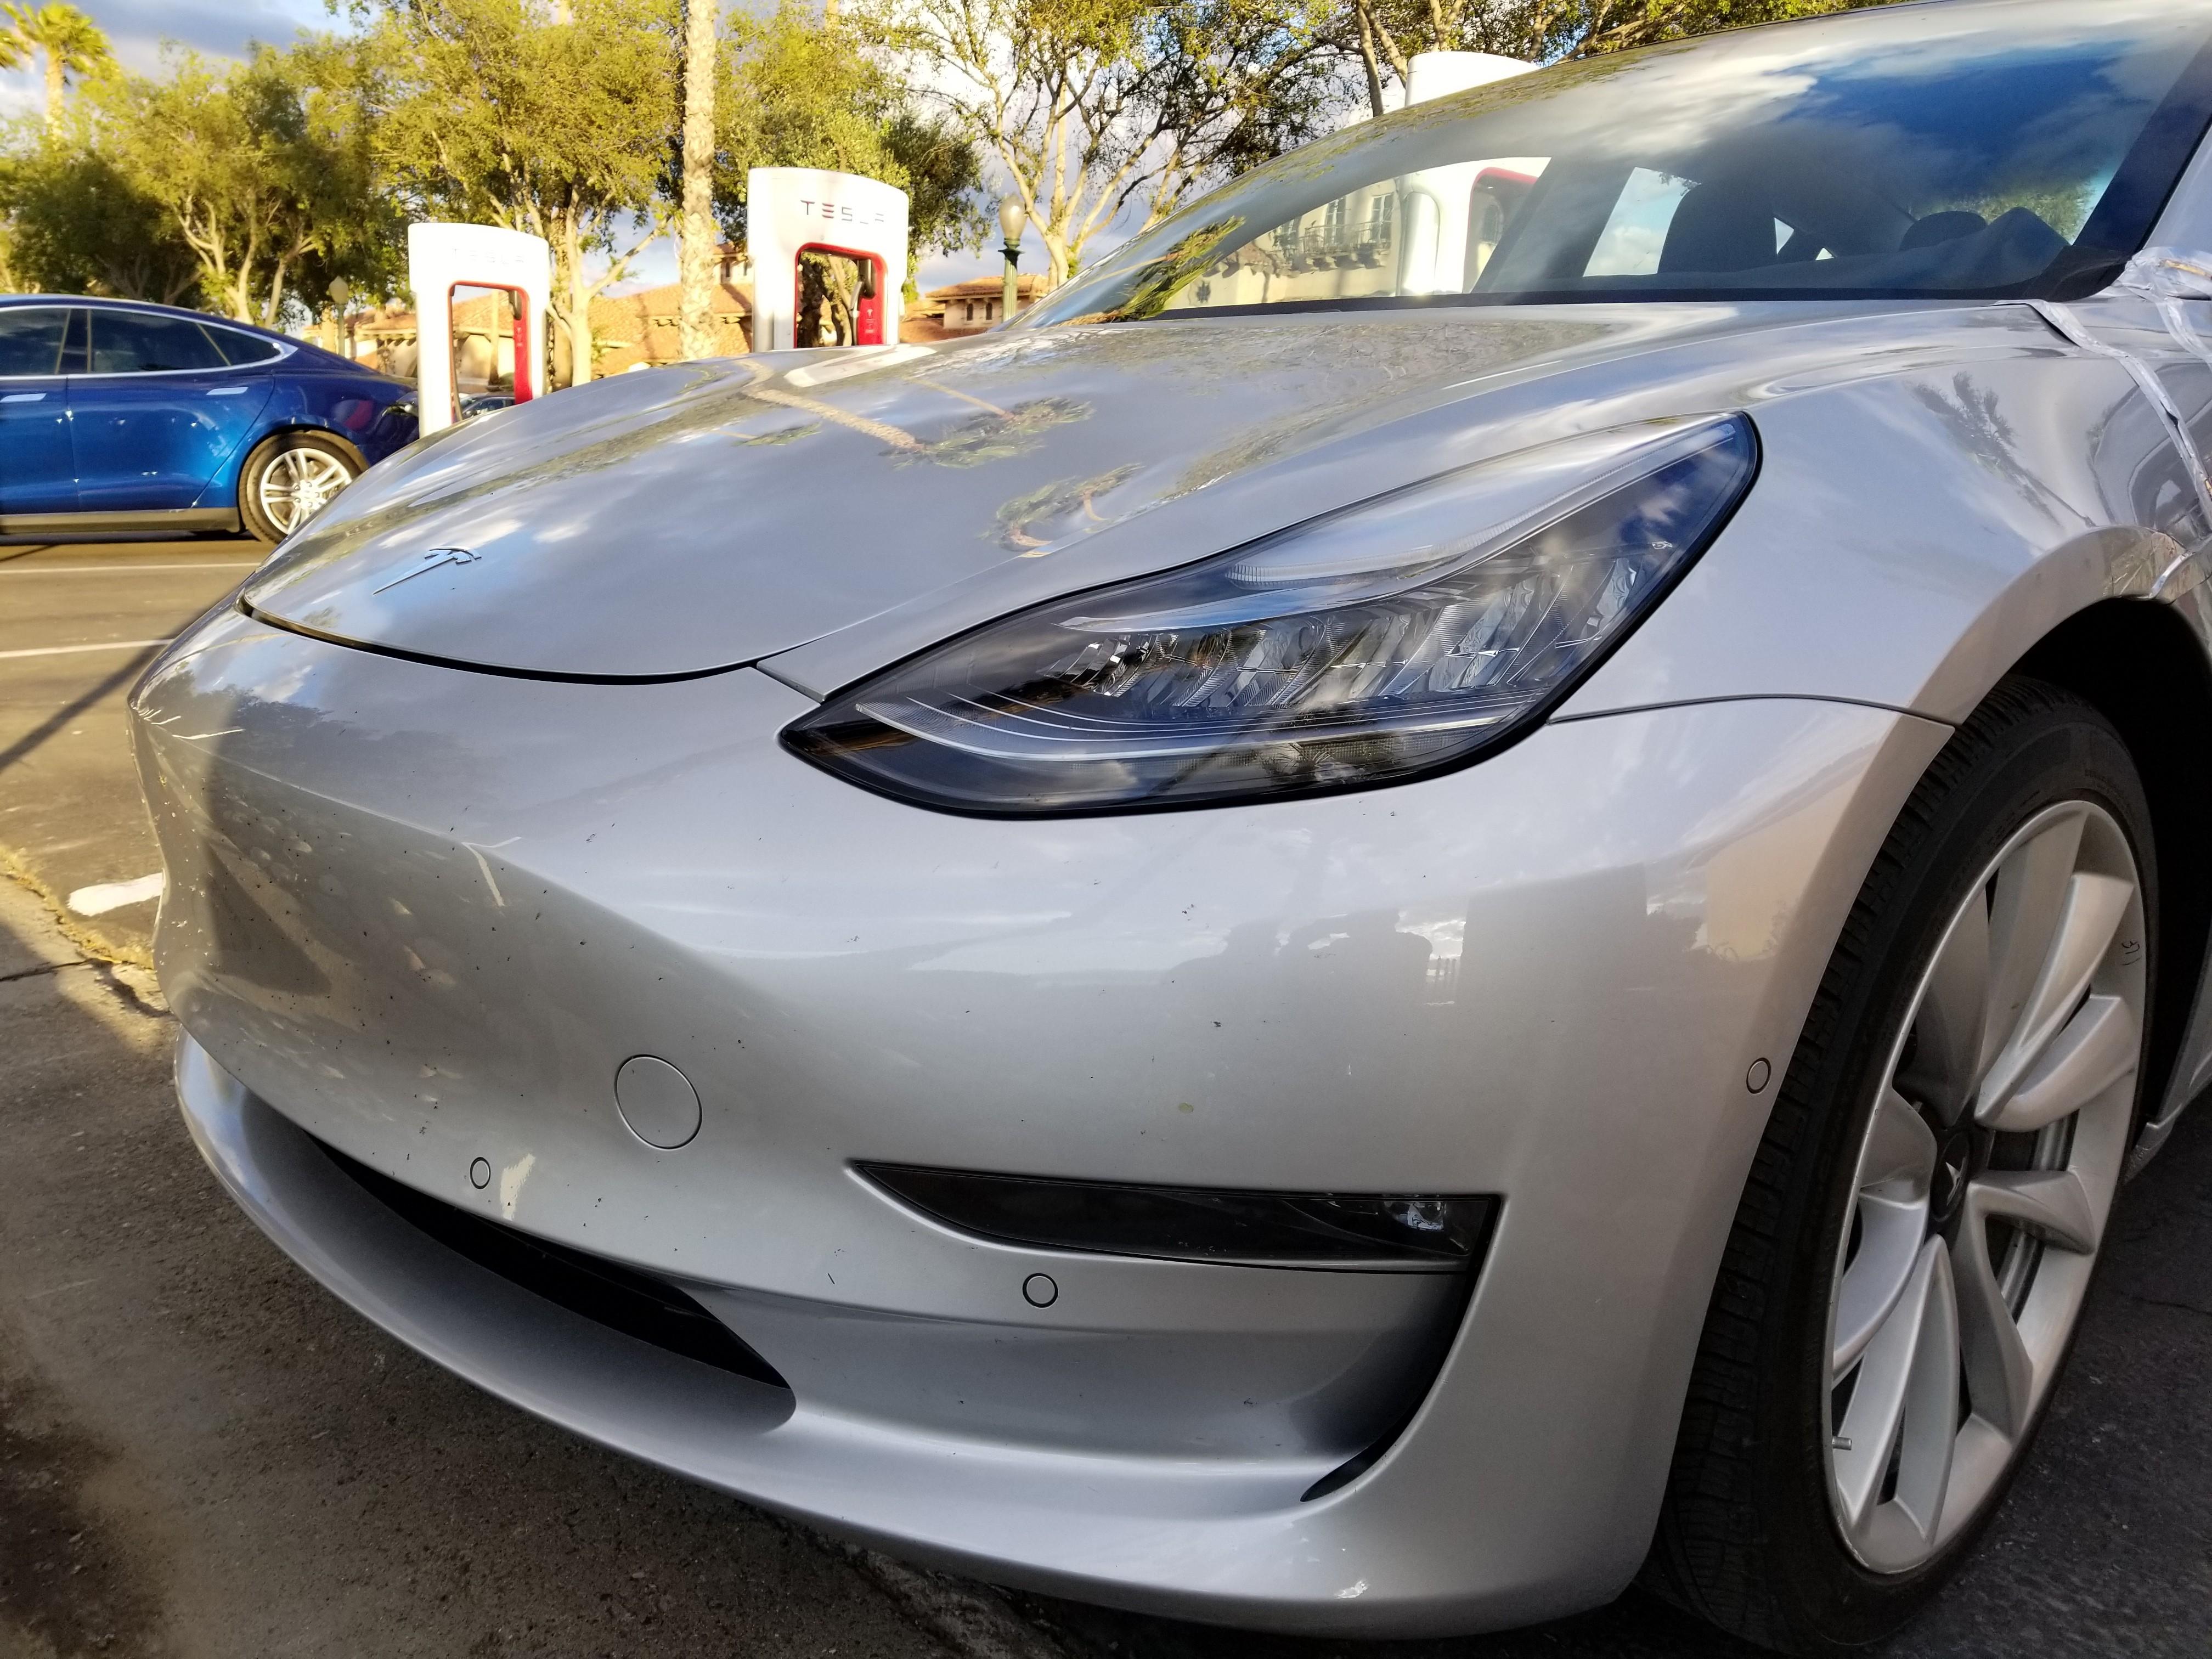 Closest Look Yet At Tesla Model 3 Exposes Panel Gaps, Manual